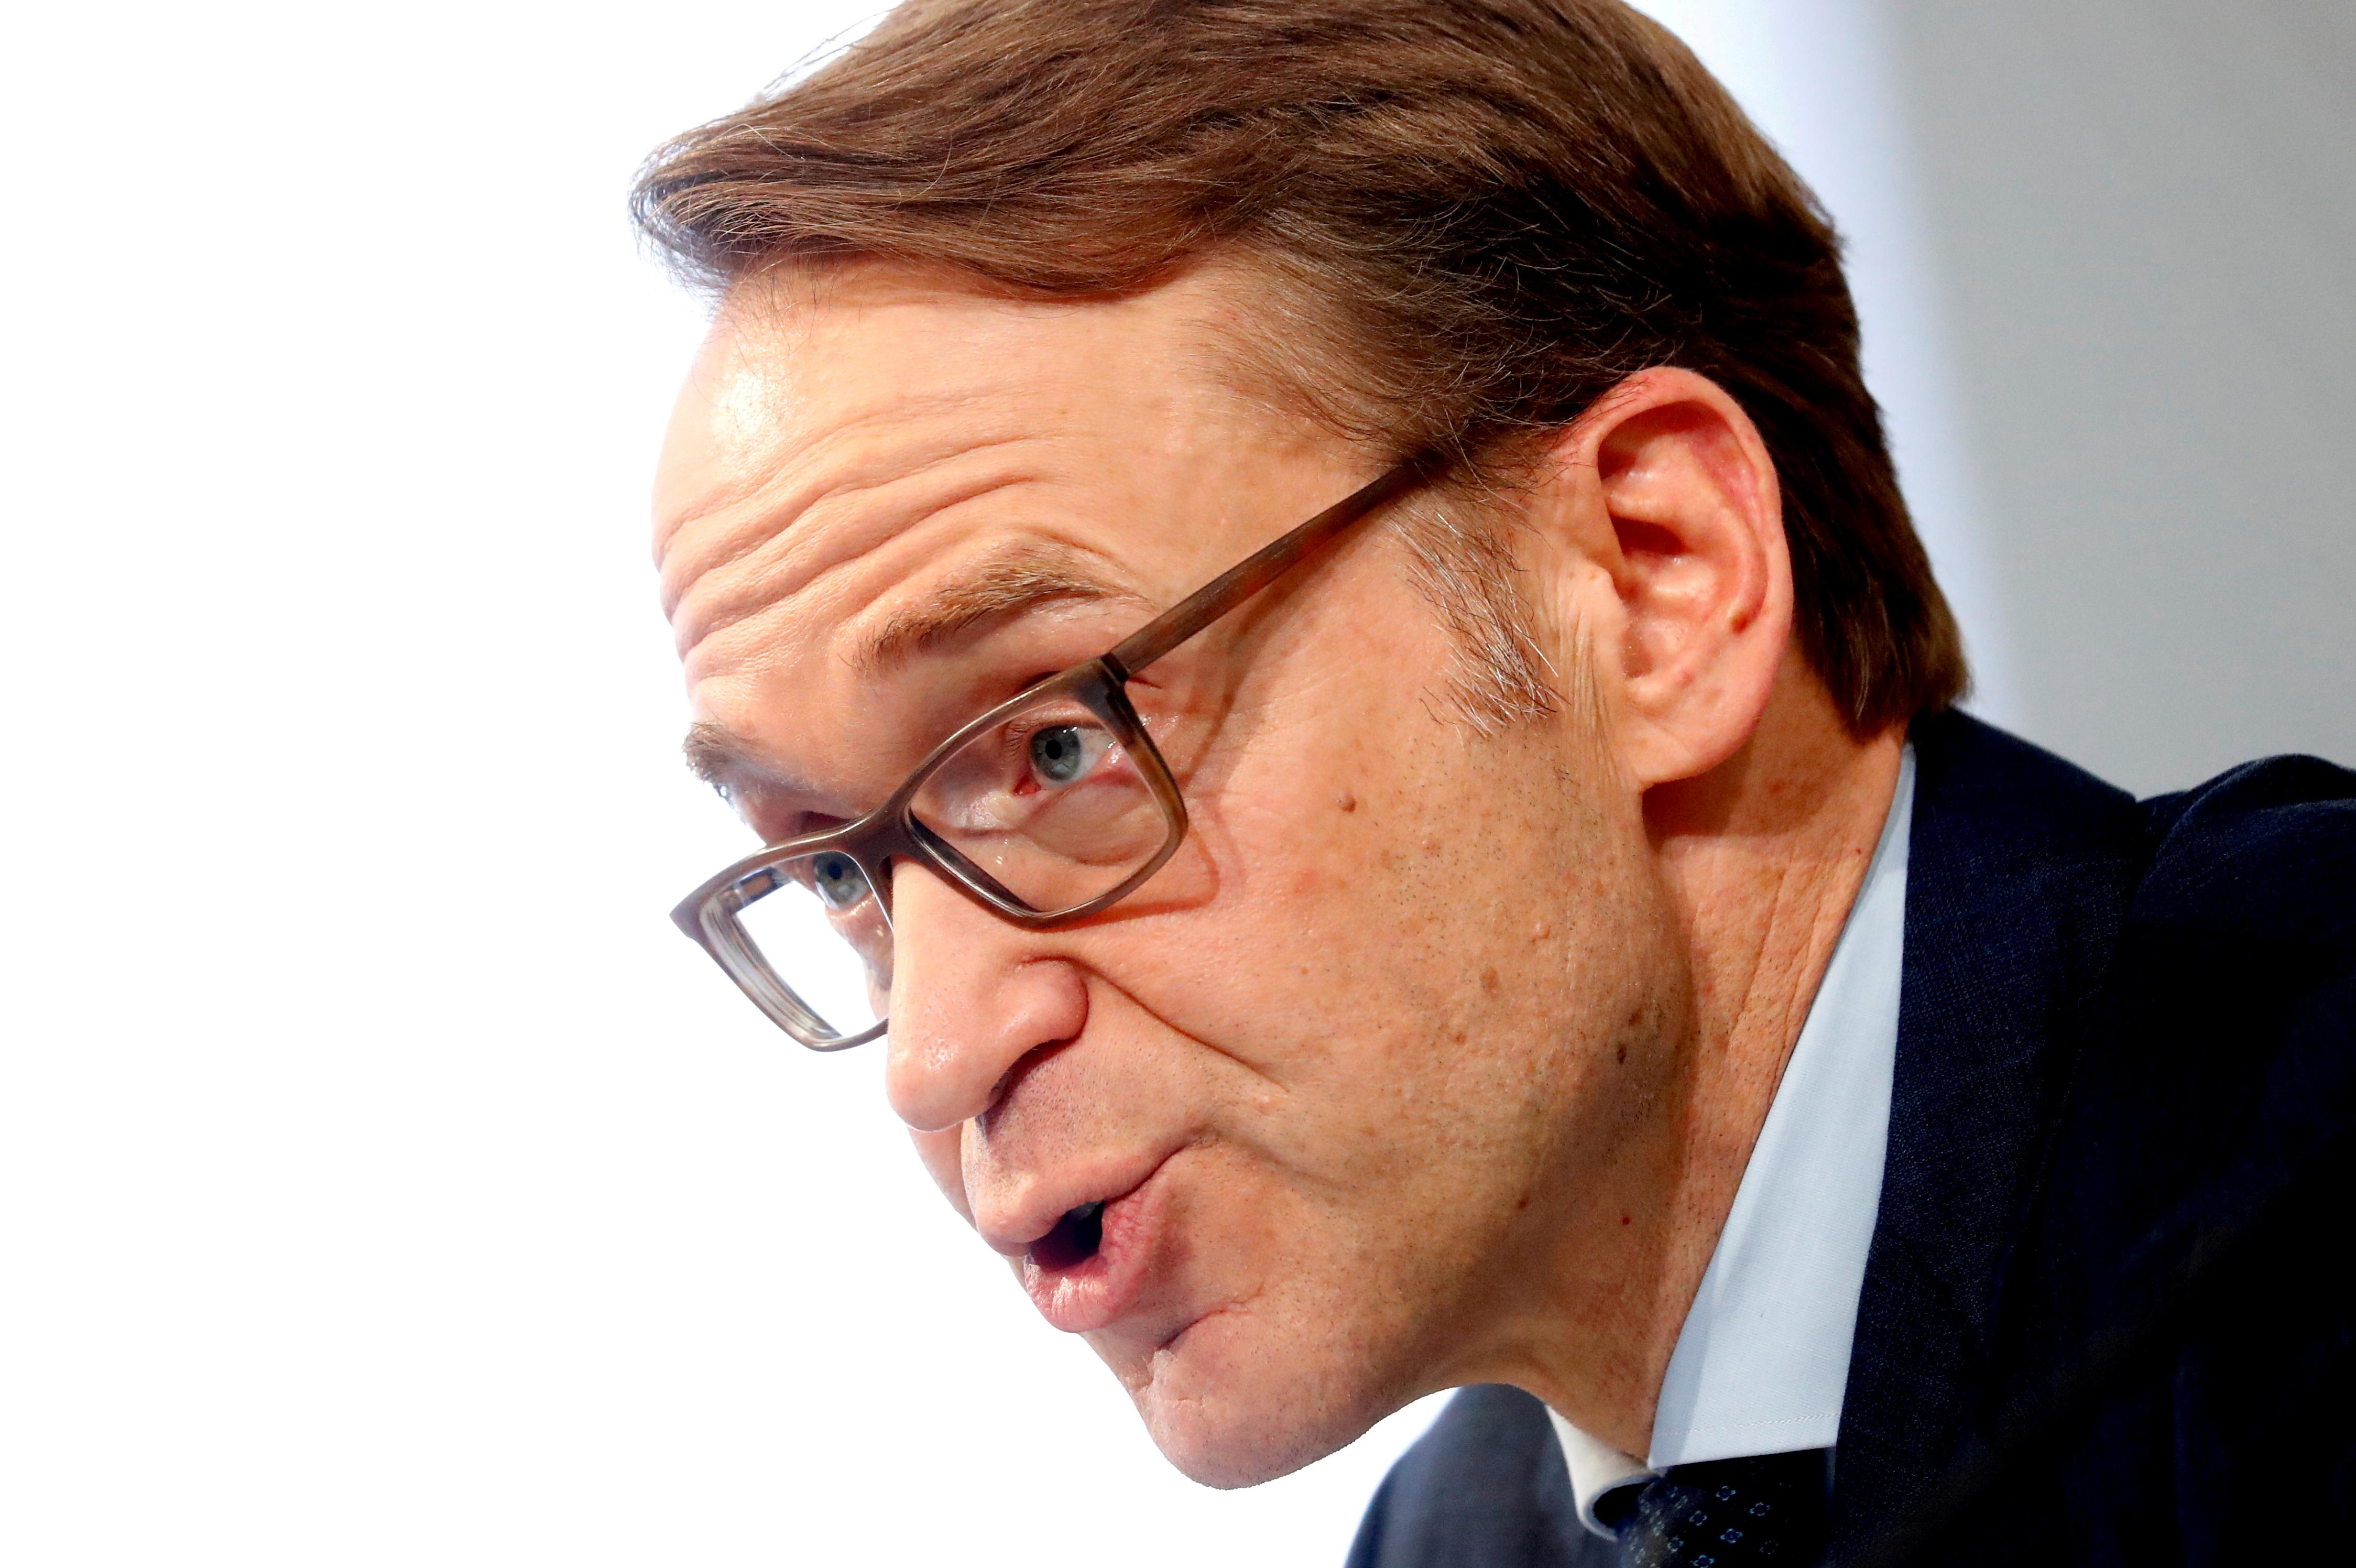 FILE PHOTO: German Bundesbank President Jens Weidmann presents the annual 2018 report in Frankfurt, Germany, February 27, 2019. REUTERS/Kai Pfaffenbach/File Photo/File Photo